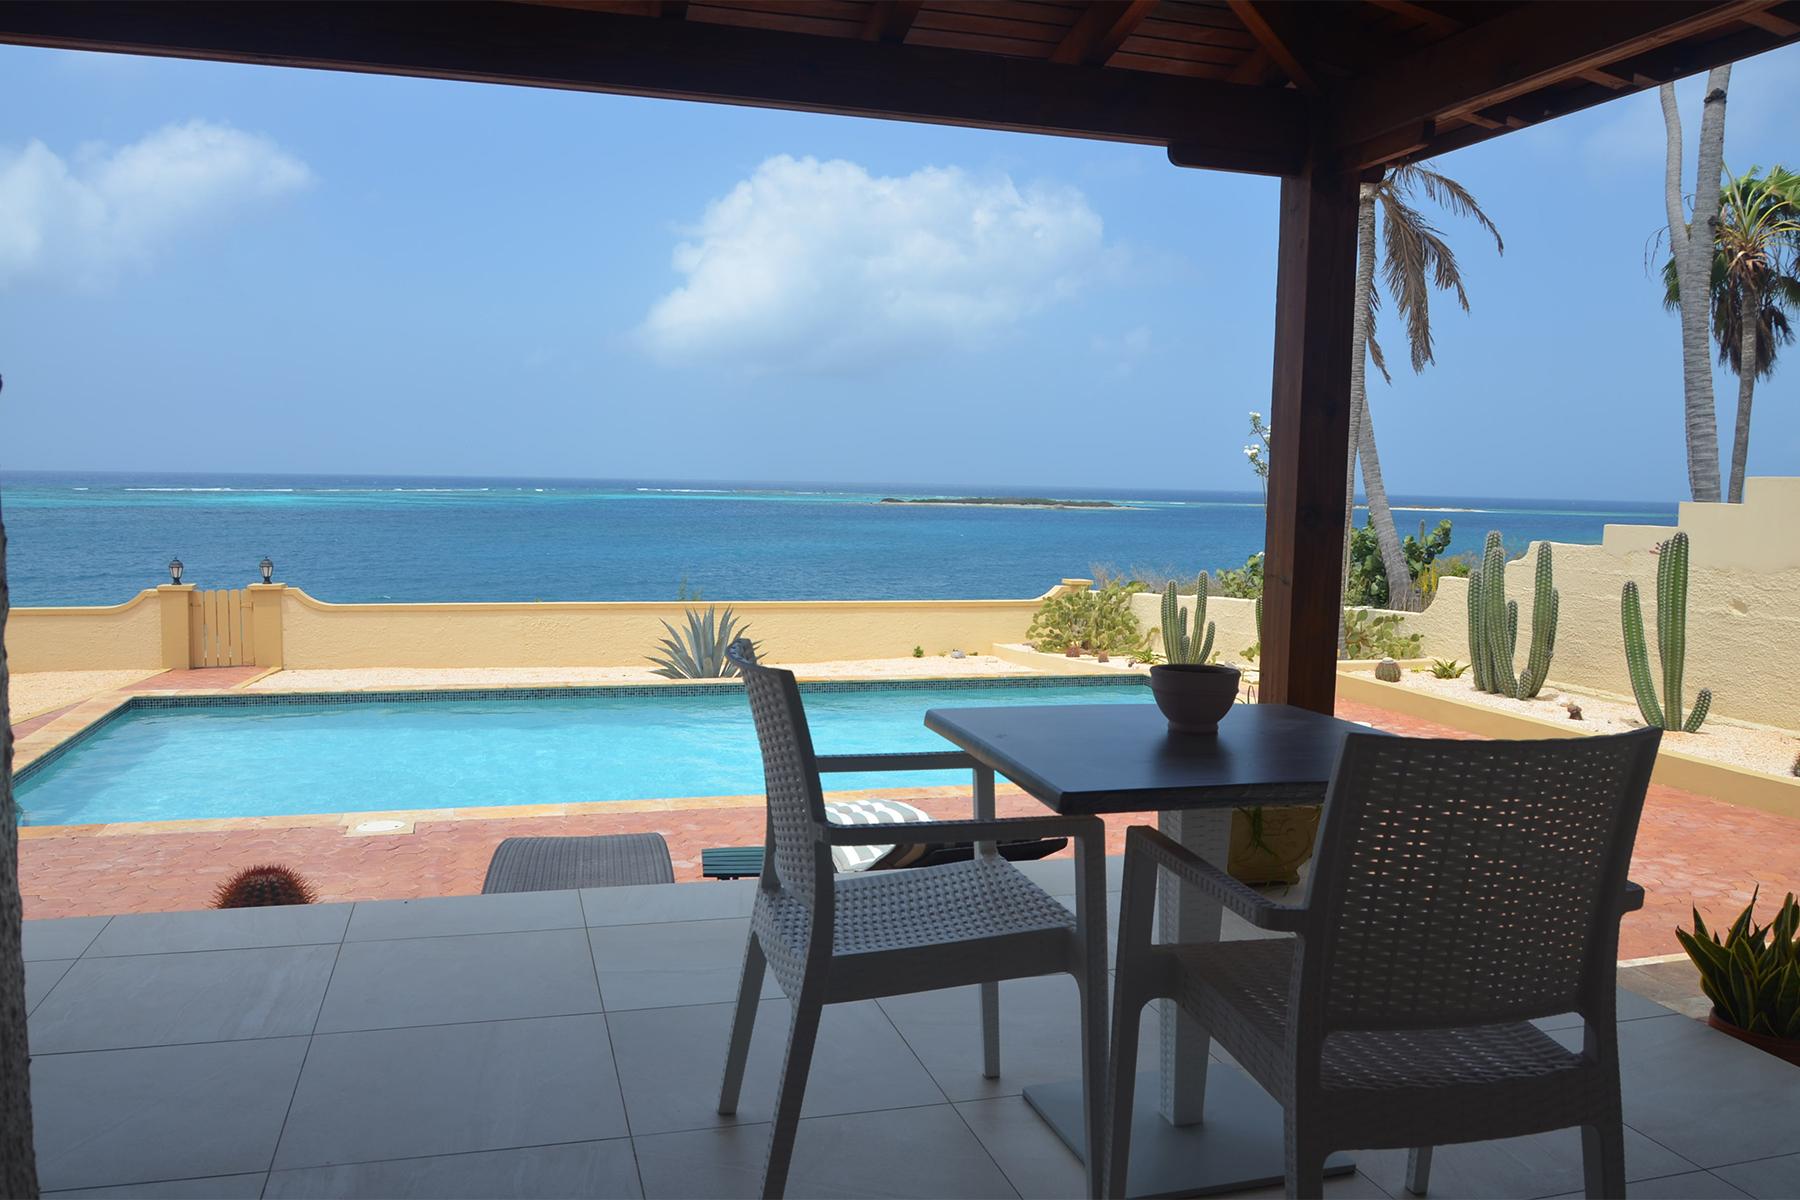 Single Family Home for Sale at Aruba Beach House San Nicolas, Aruba Aruba